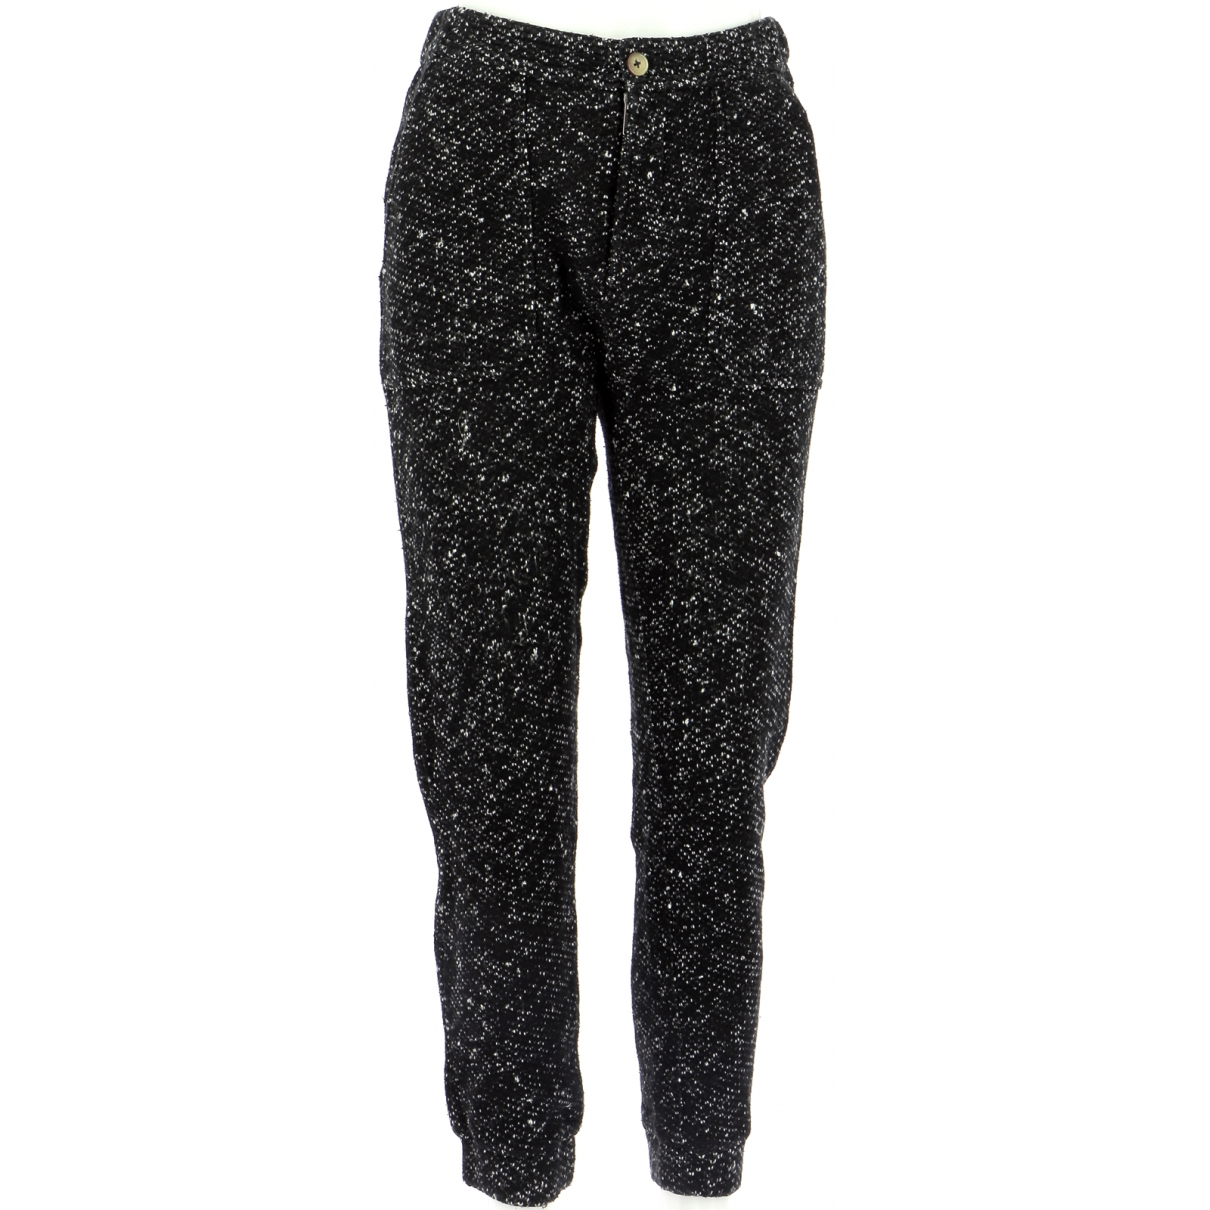 Pantalones en Algodon Negro Leon & Harper